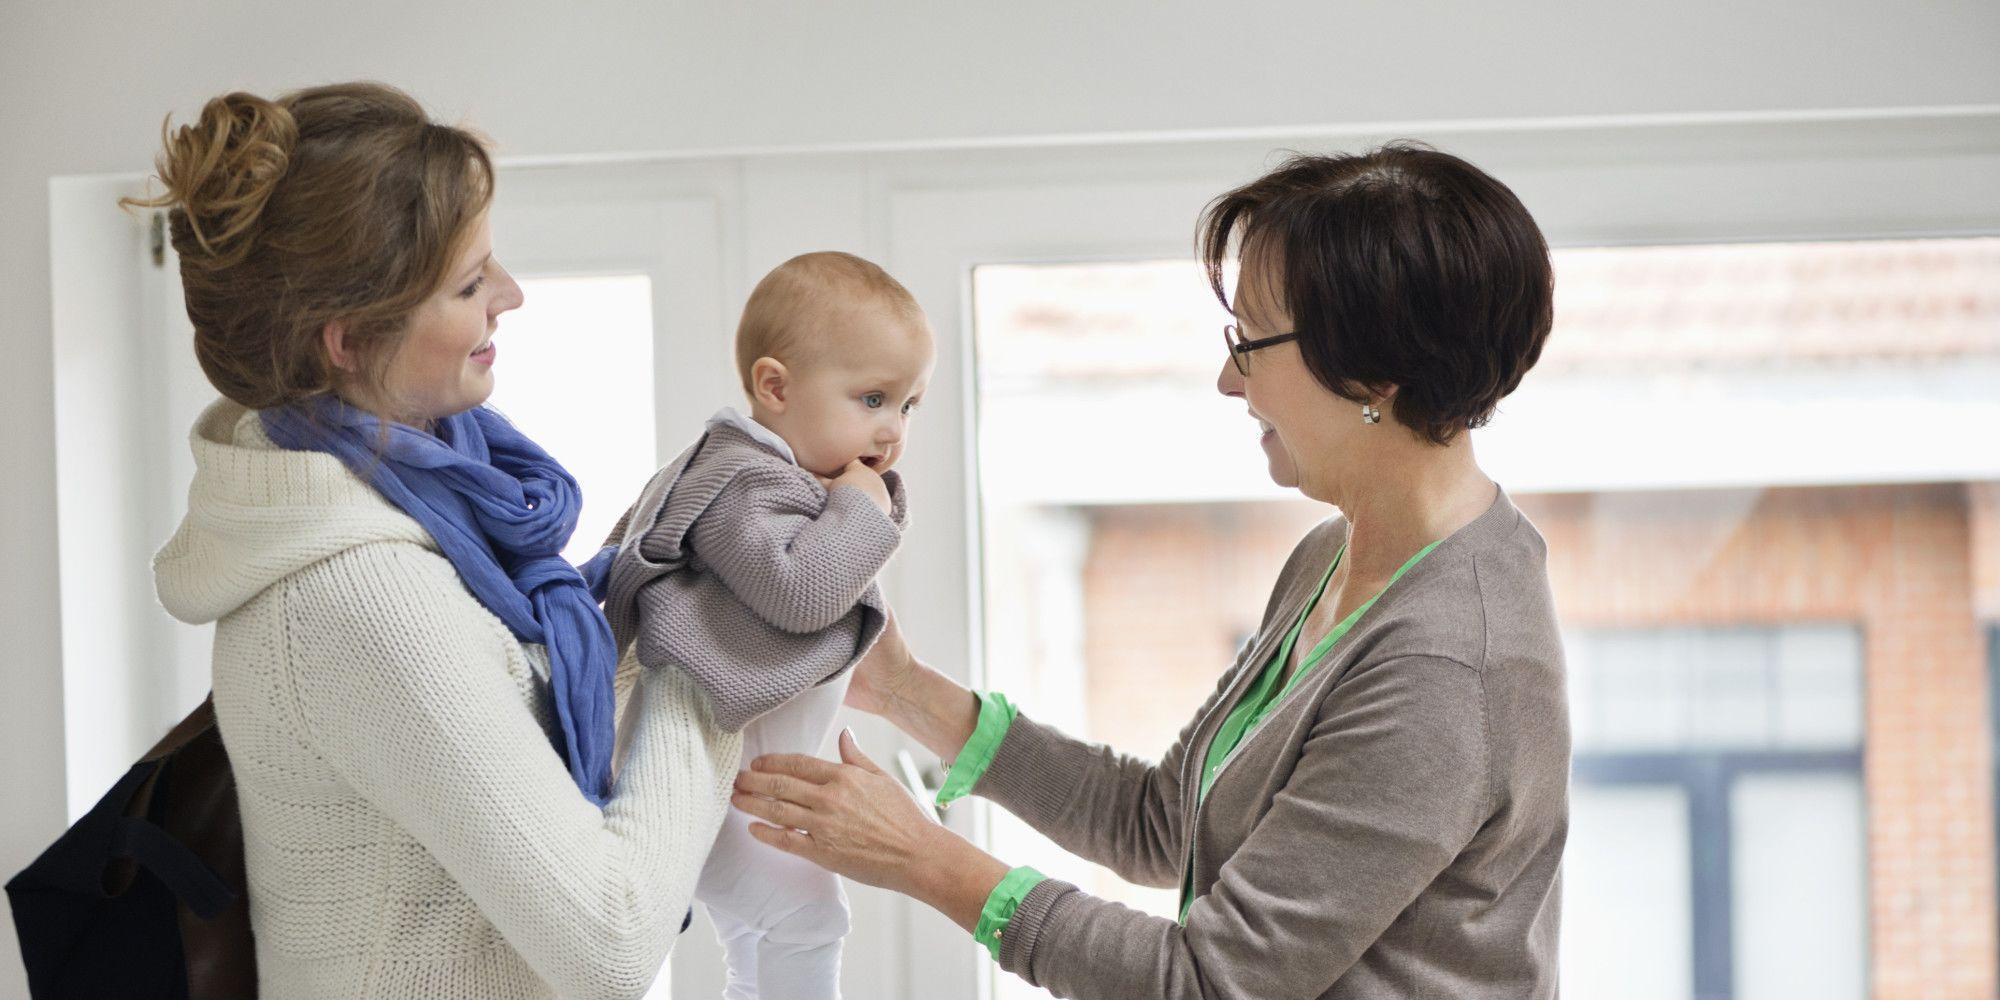 6. Seleksi calon pengasuh bayi